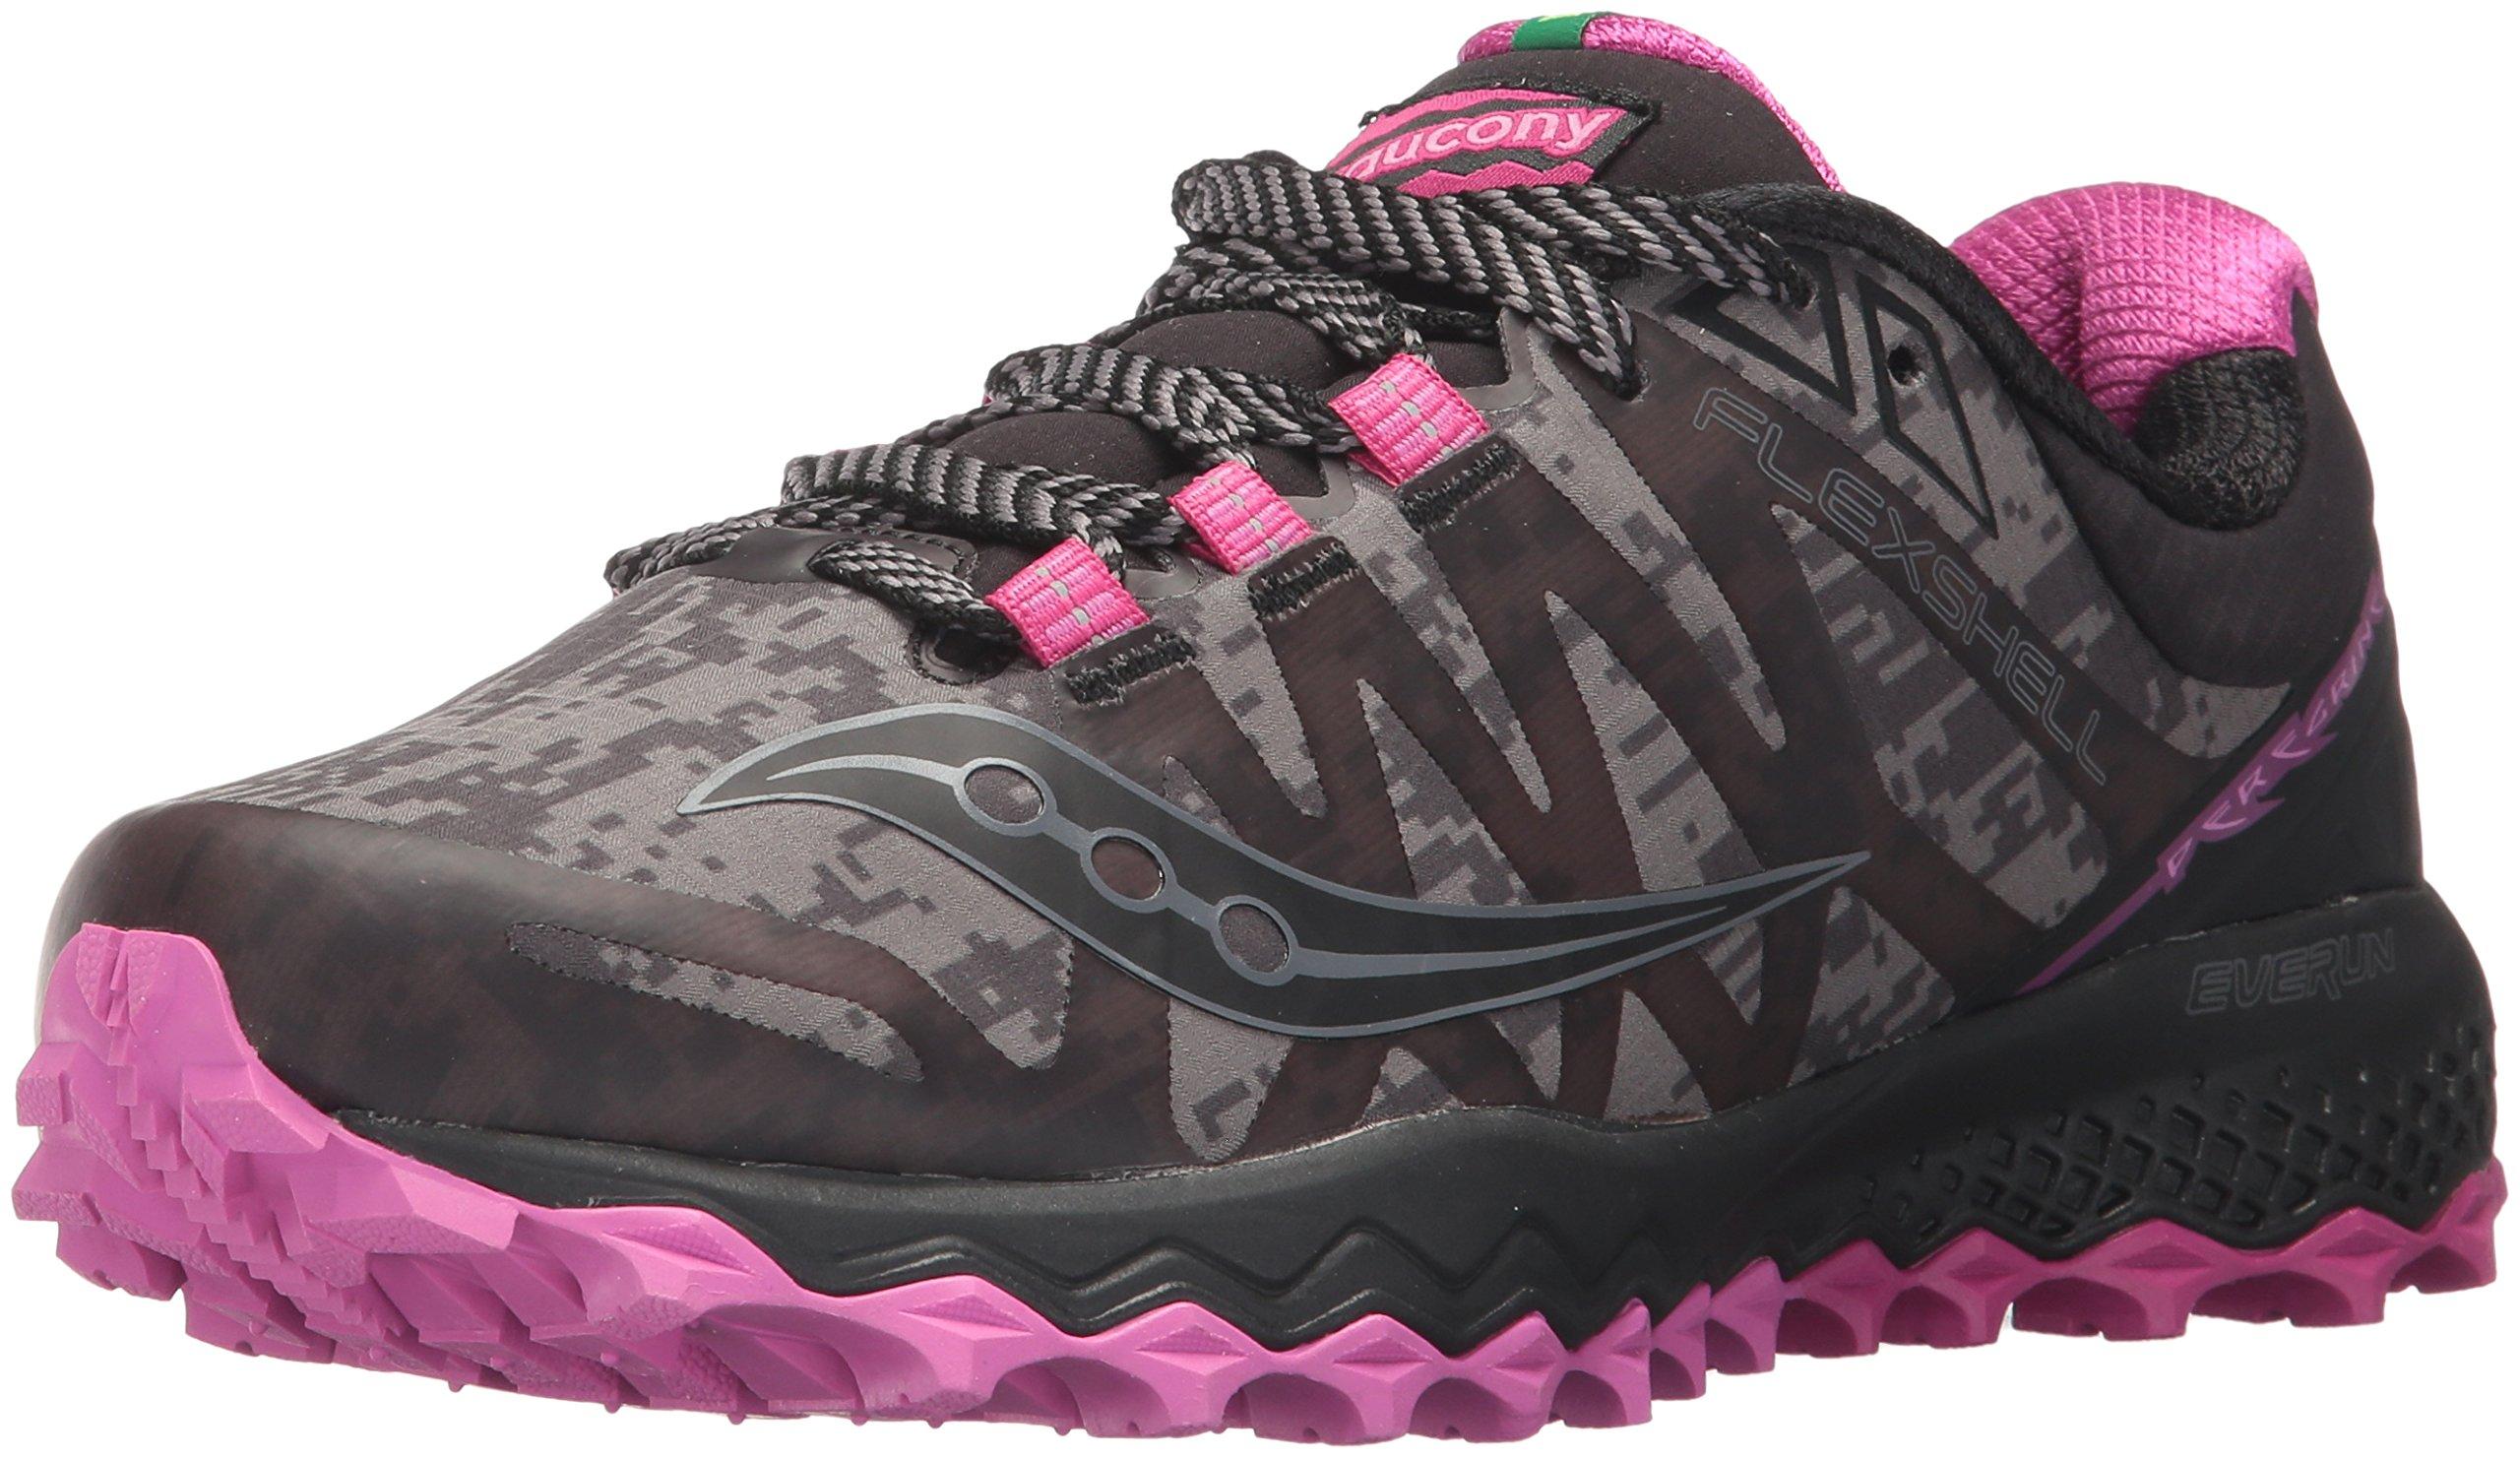 Saucony Women's Peregrine 7 Runshield Running Shoe, Black Pink, 5.5 Medium US